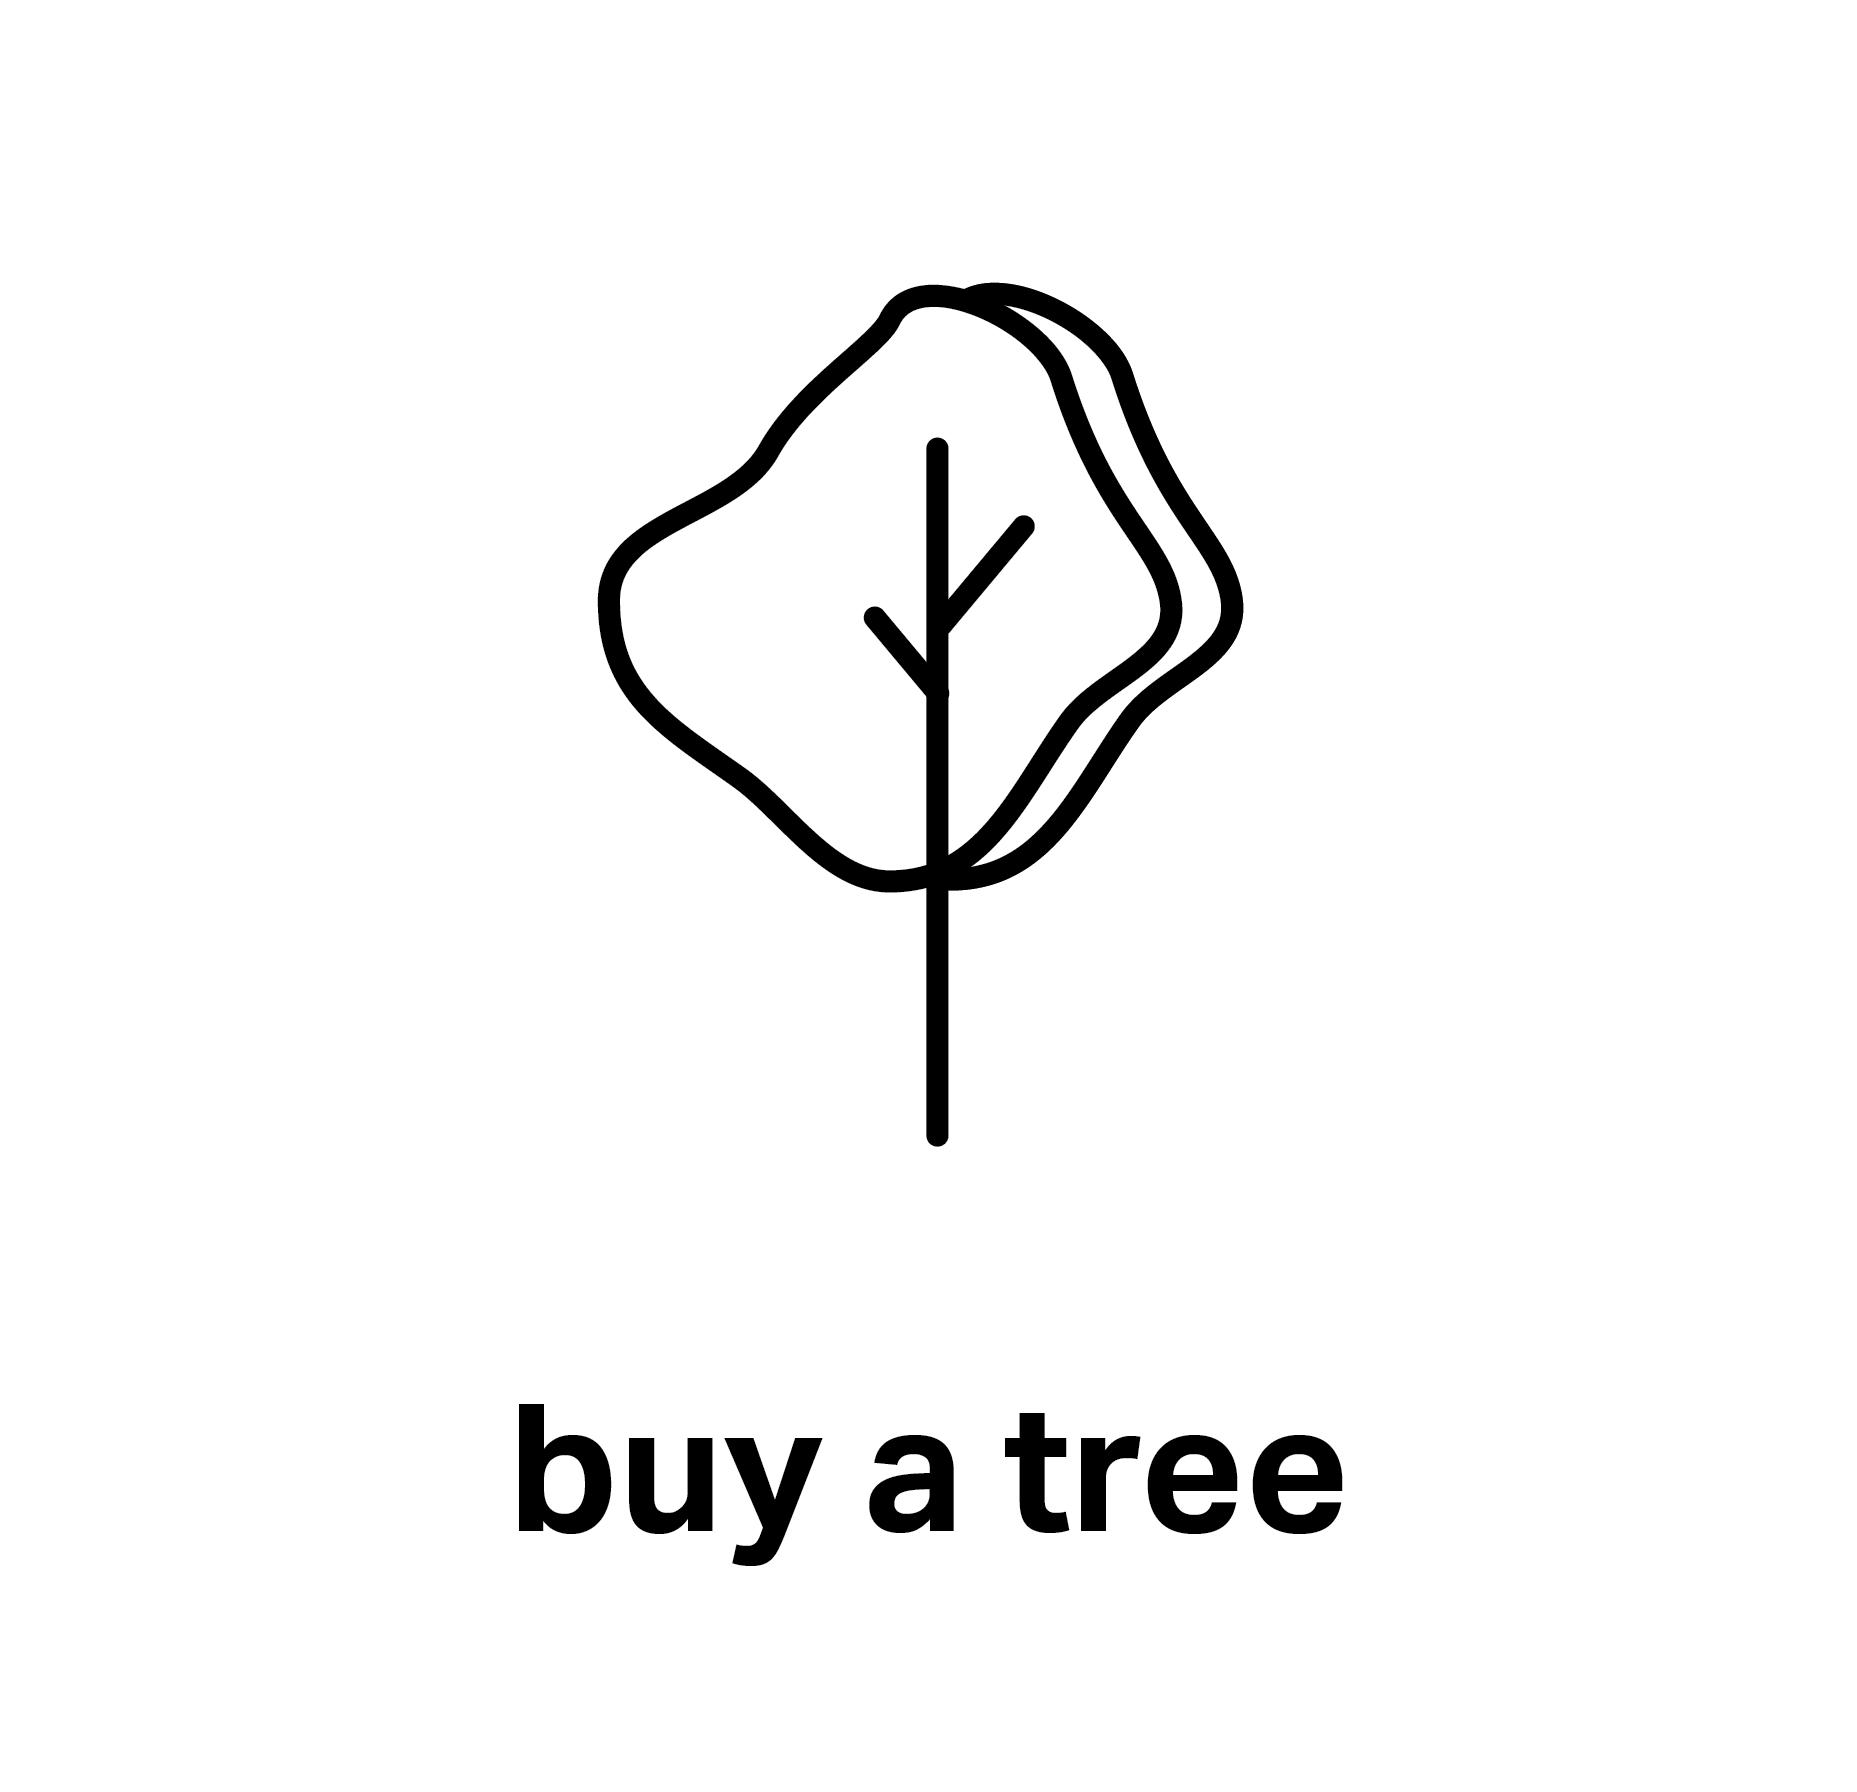 Asset 6CoreCityMobileShopIcon_Tree.png